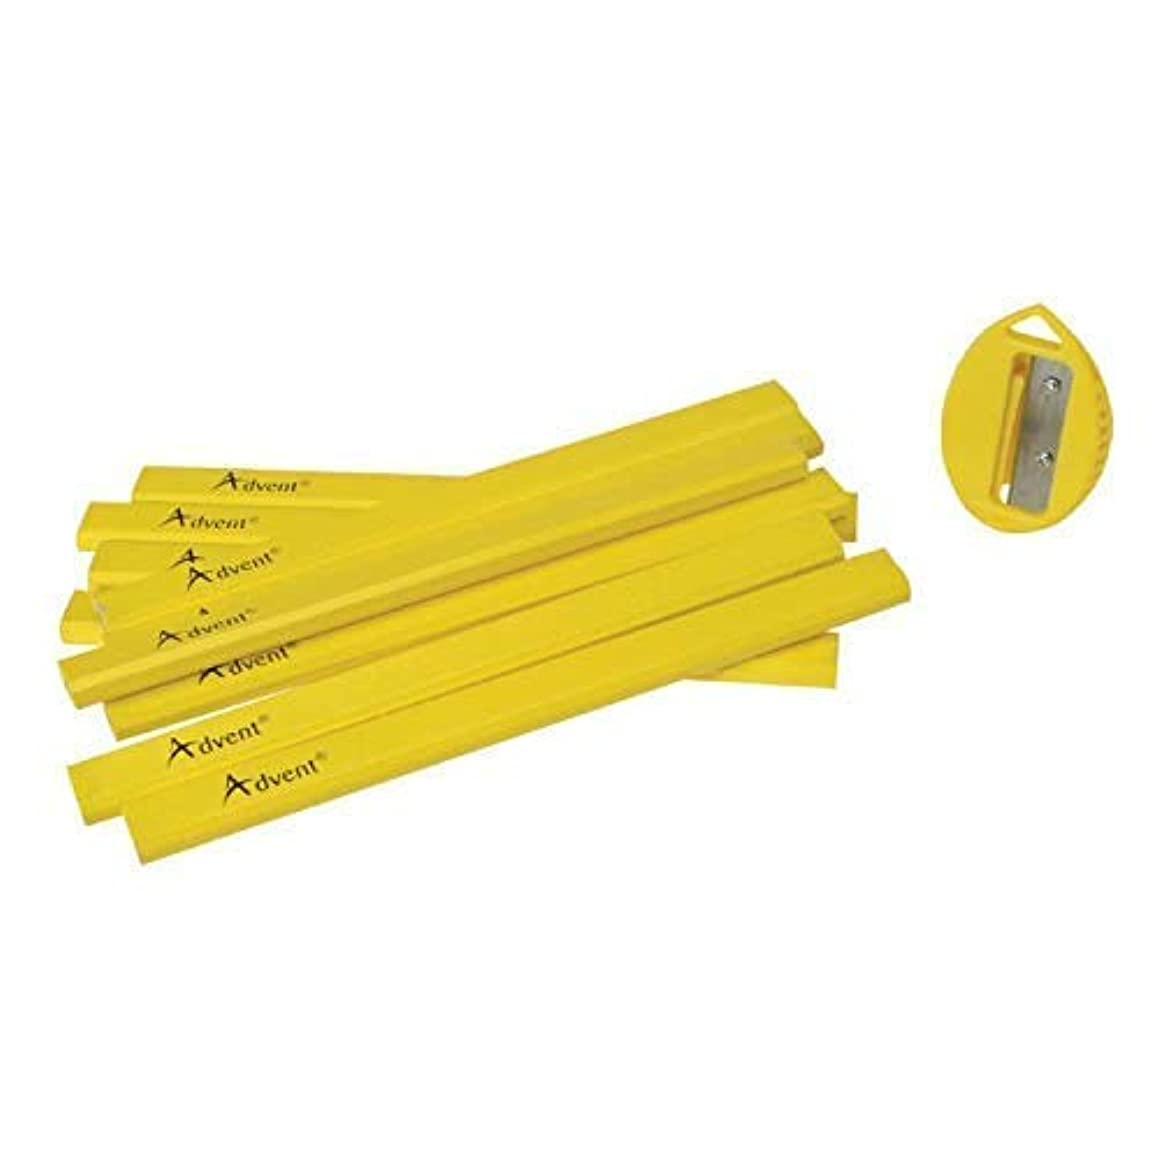 realdealforyou.co.uk XMS18PENCILS Advent Carpenter Pencils (Pack of 10) & Sharpener,